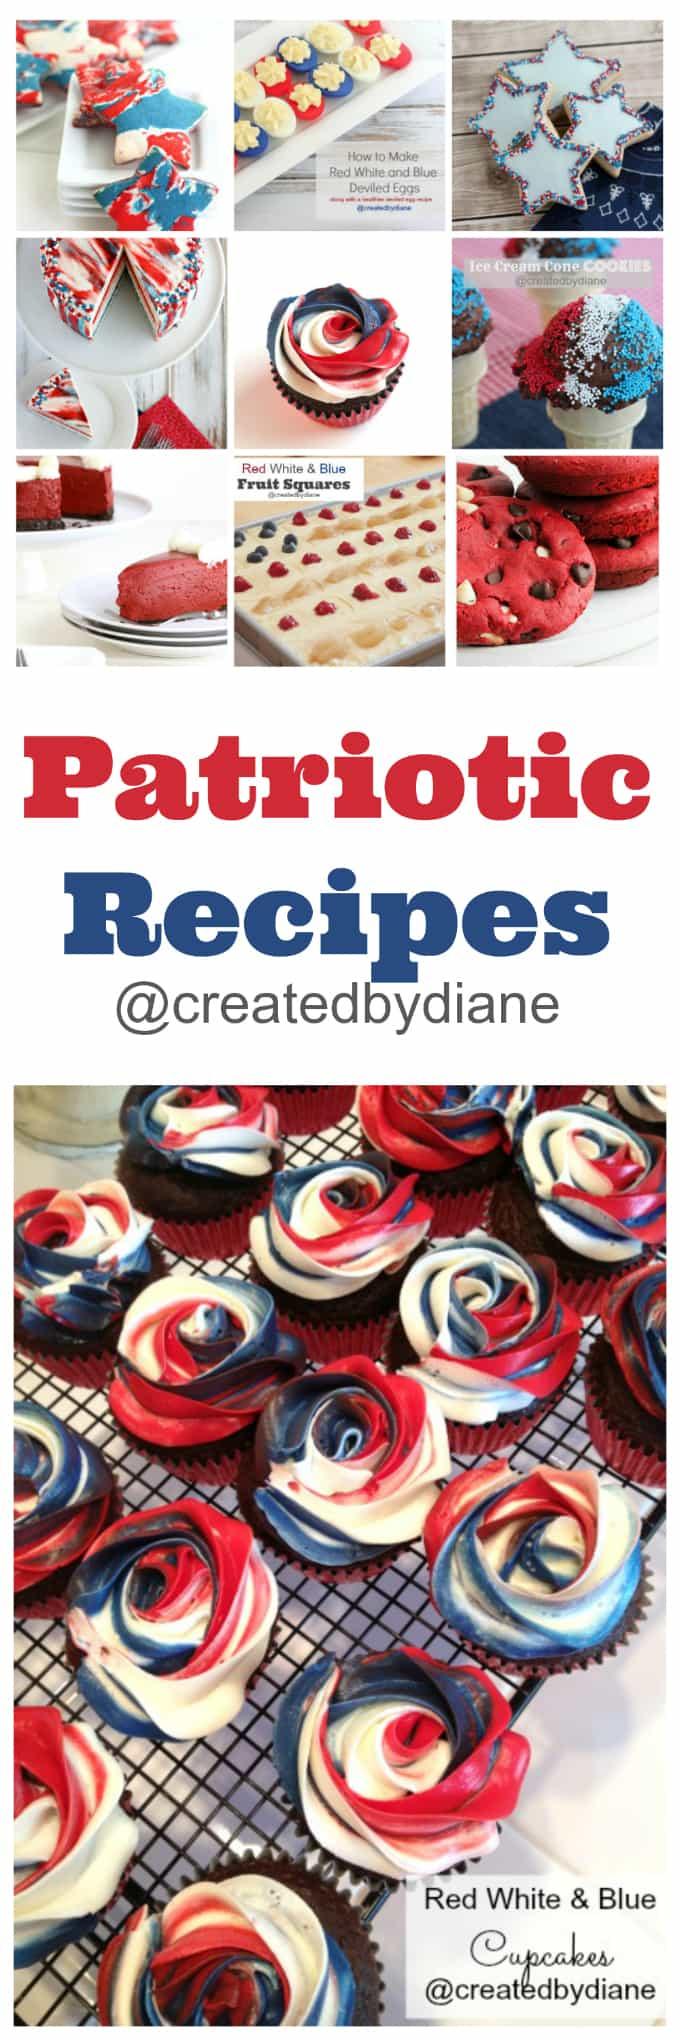 patriotic recipes from @createdbydiane